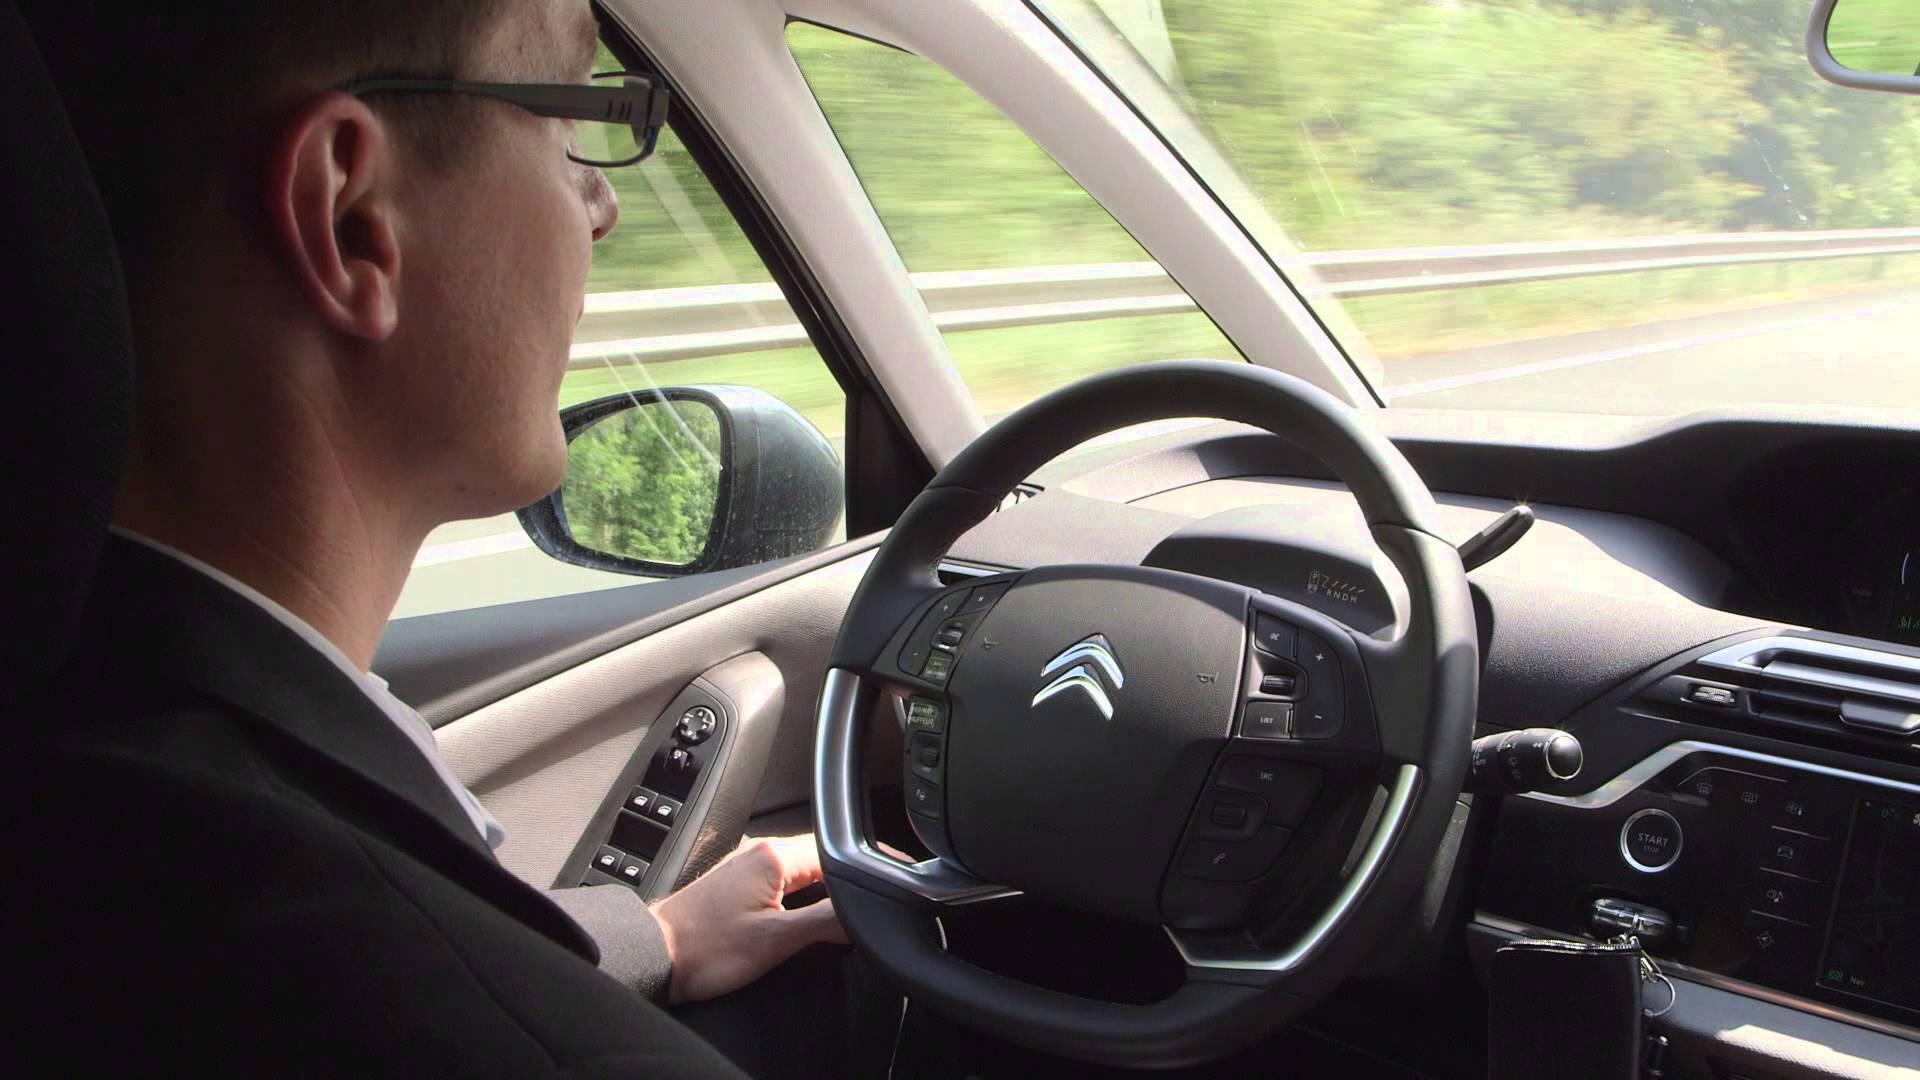 Citroen C4 Picasso autonomous car interior